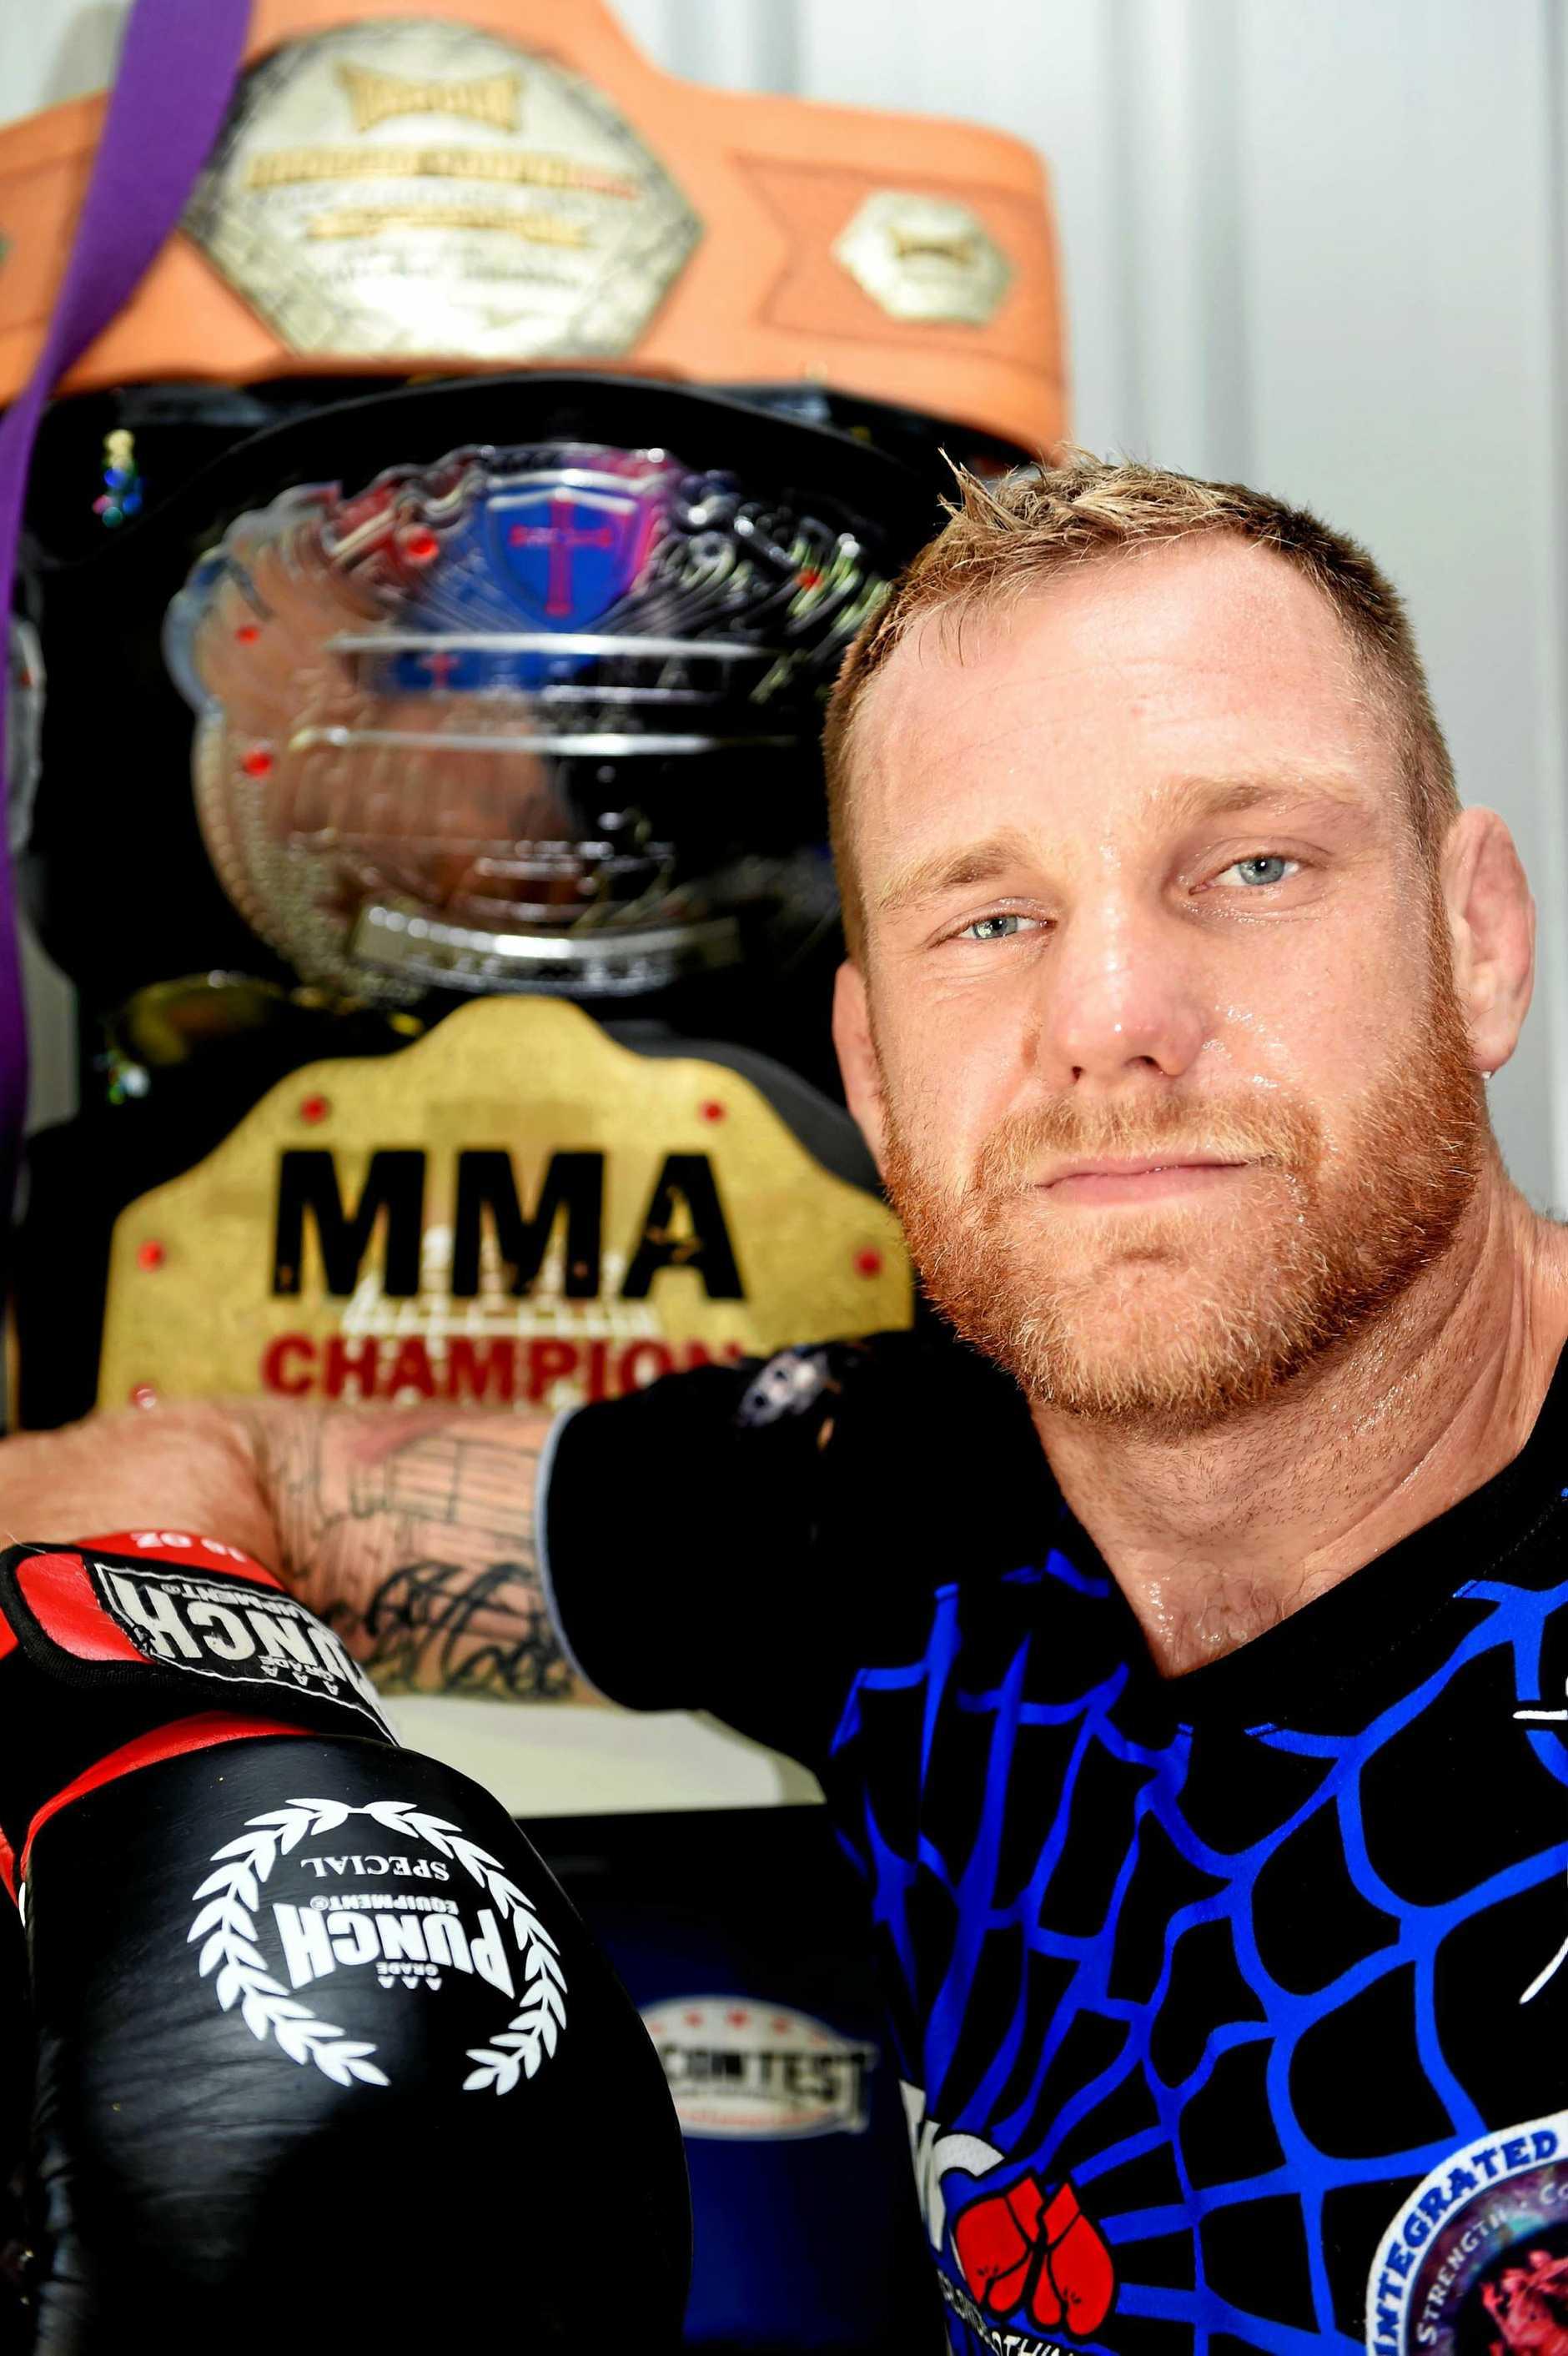 The Tarantula - MMA fighter, Greg Atzori.